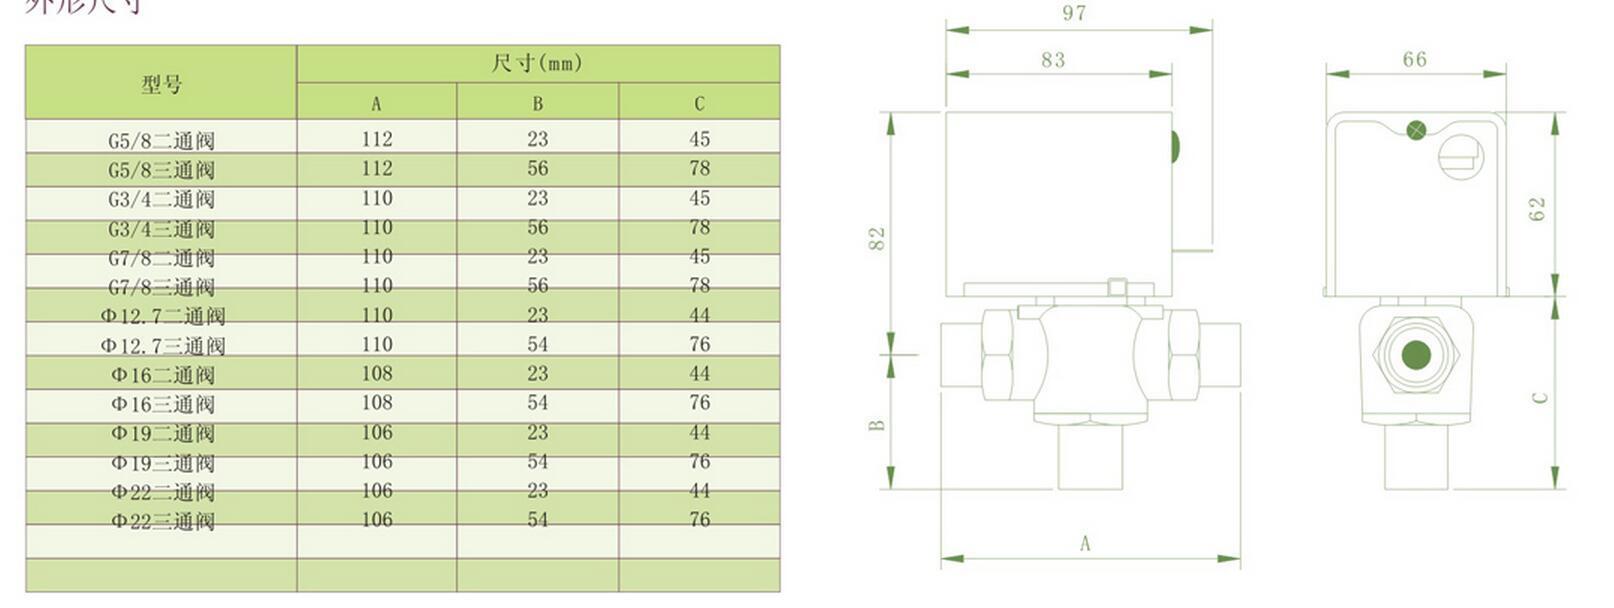 Honeywell 2 3 Port Way Motorized Zone Valve Htw W27 F China Hydronic Wiring Diagram For Faq